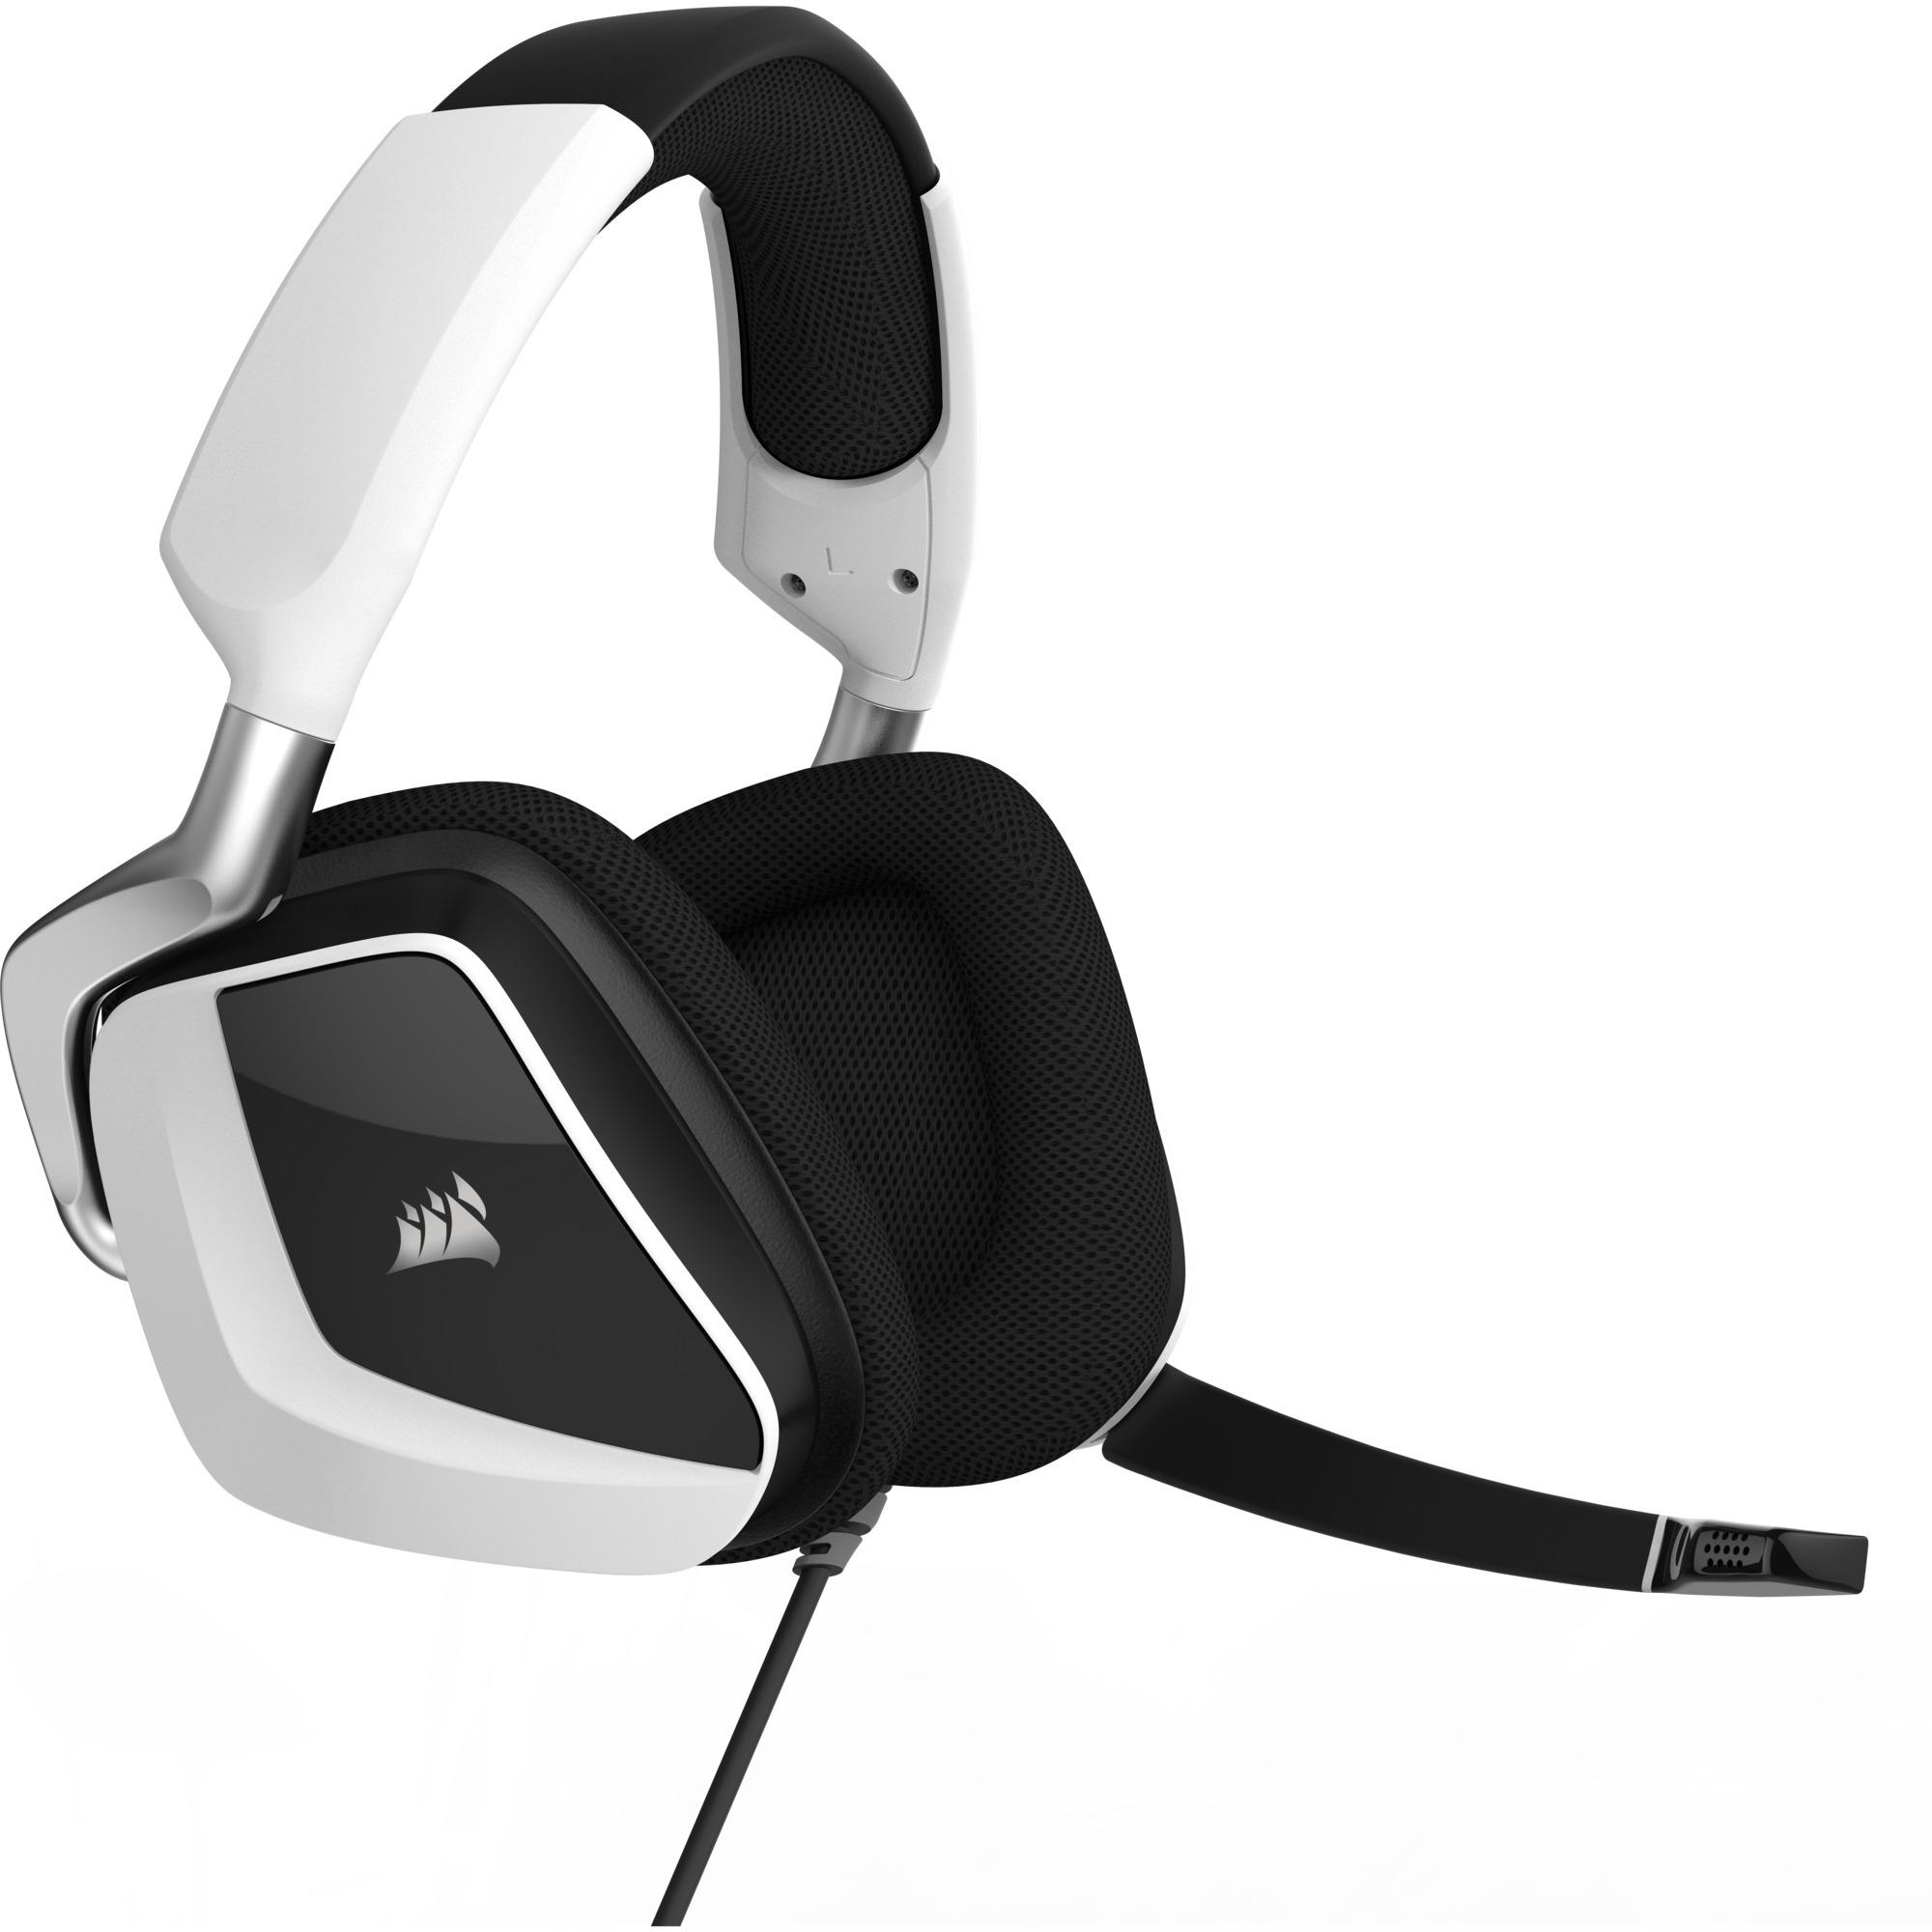 VOID PRO RGB USB Premium Binaurale Diadema Blanco auricular con micrófono, Auriculares...